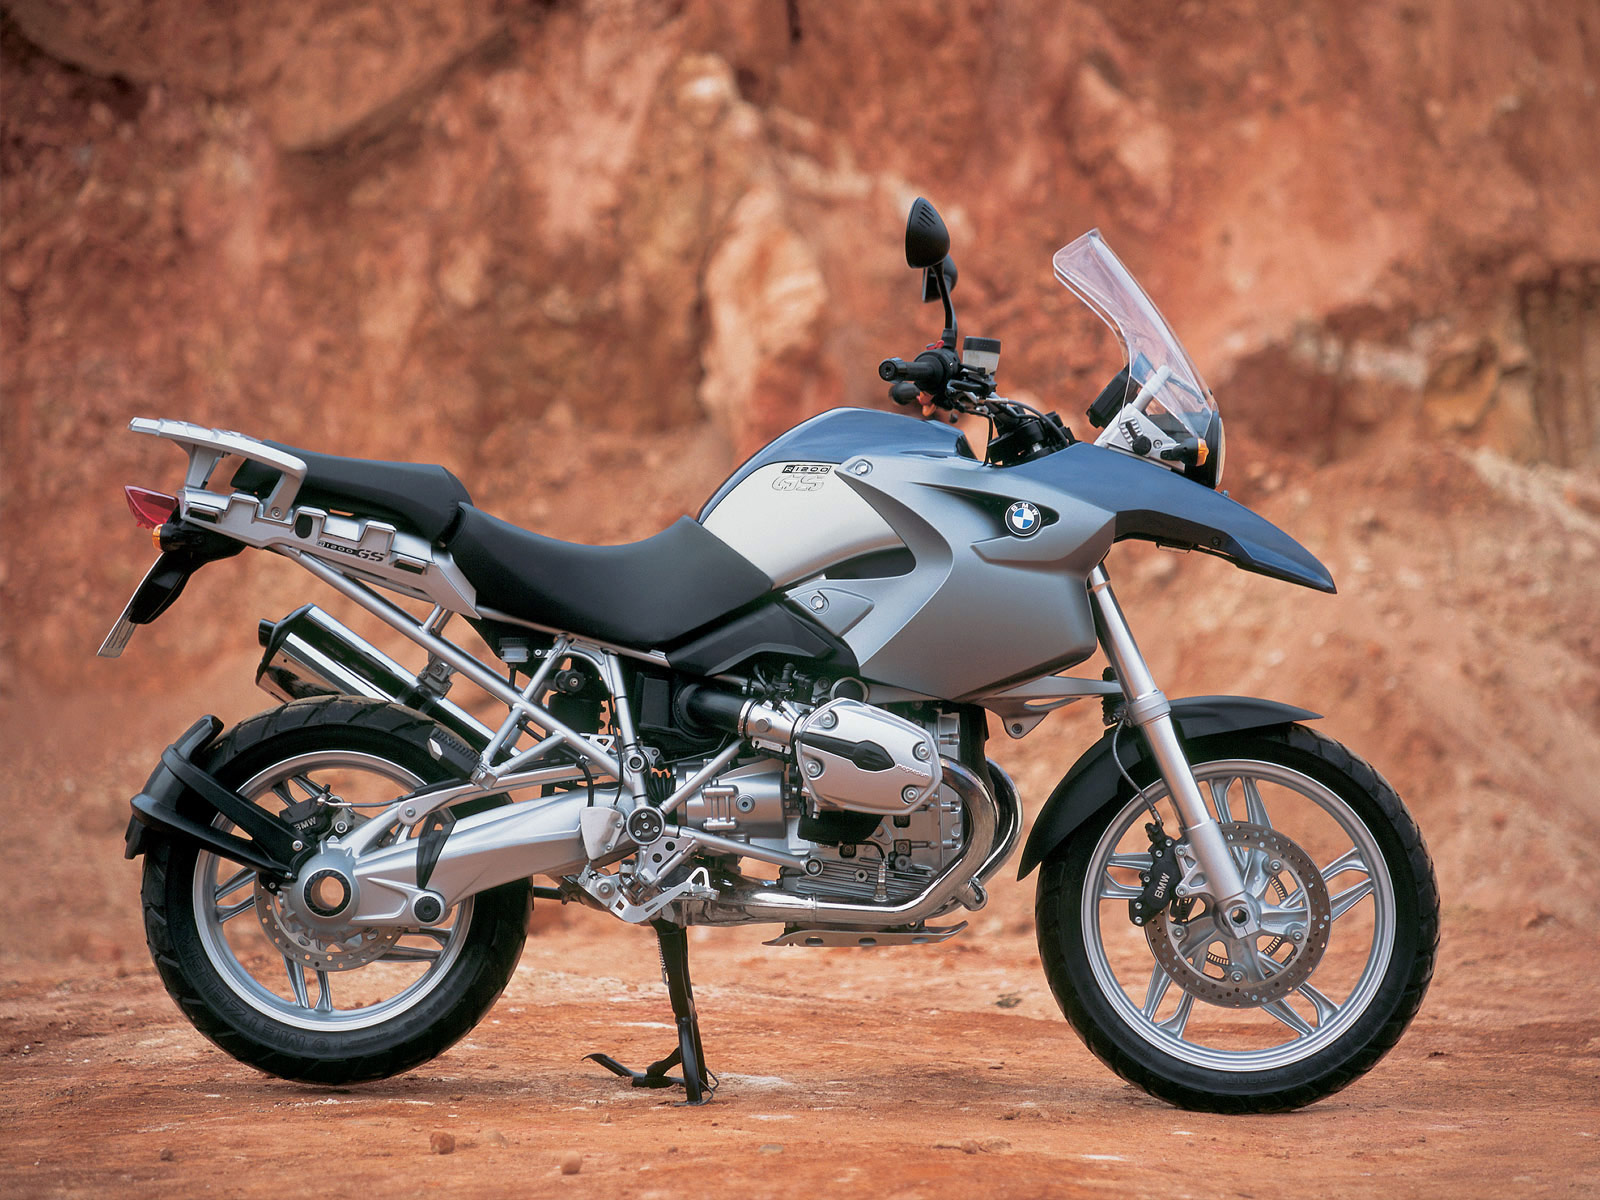 bmw r 1200 gs motorcycle desktop wallpaper accident lawyers info. Black Bedroom Furniture Sets. Home Design Ideas